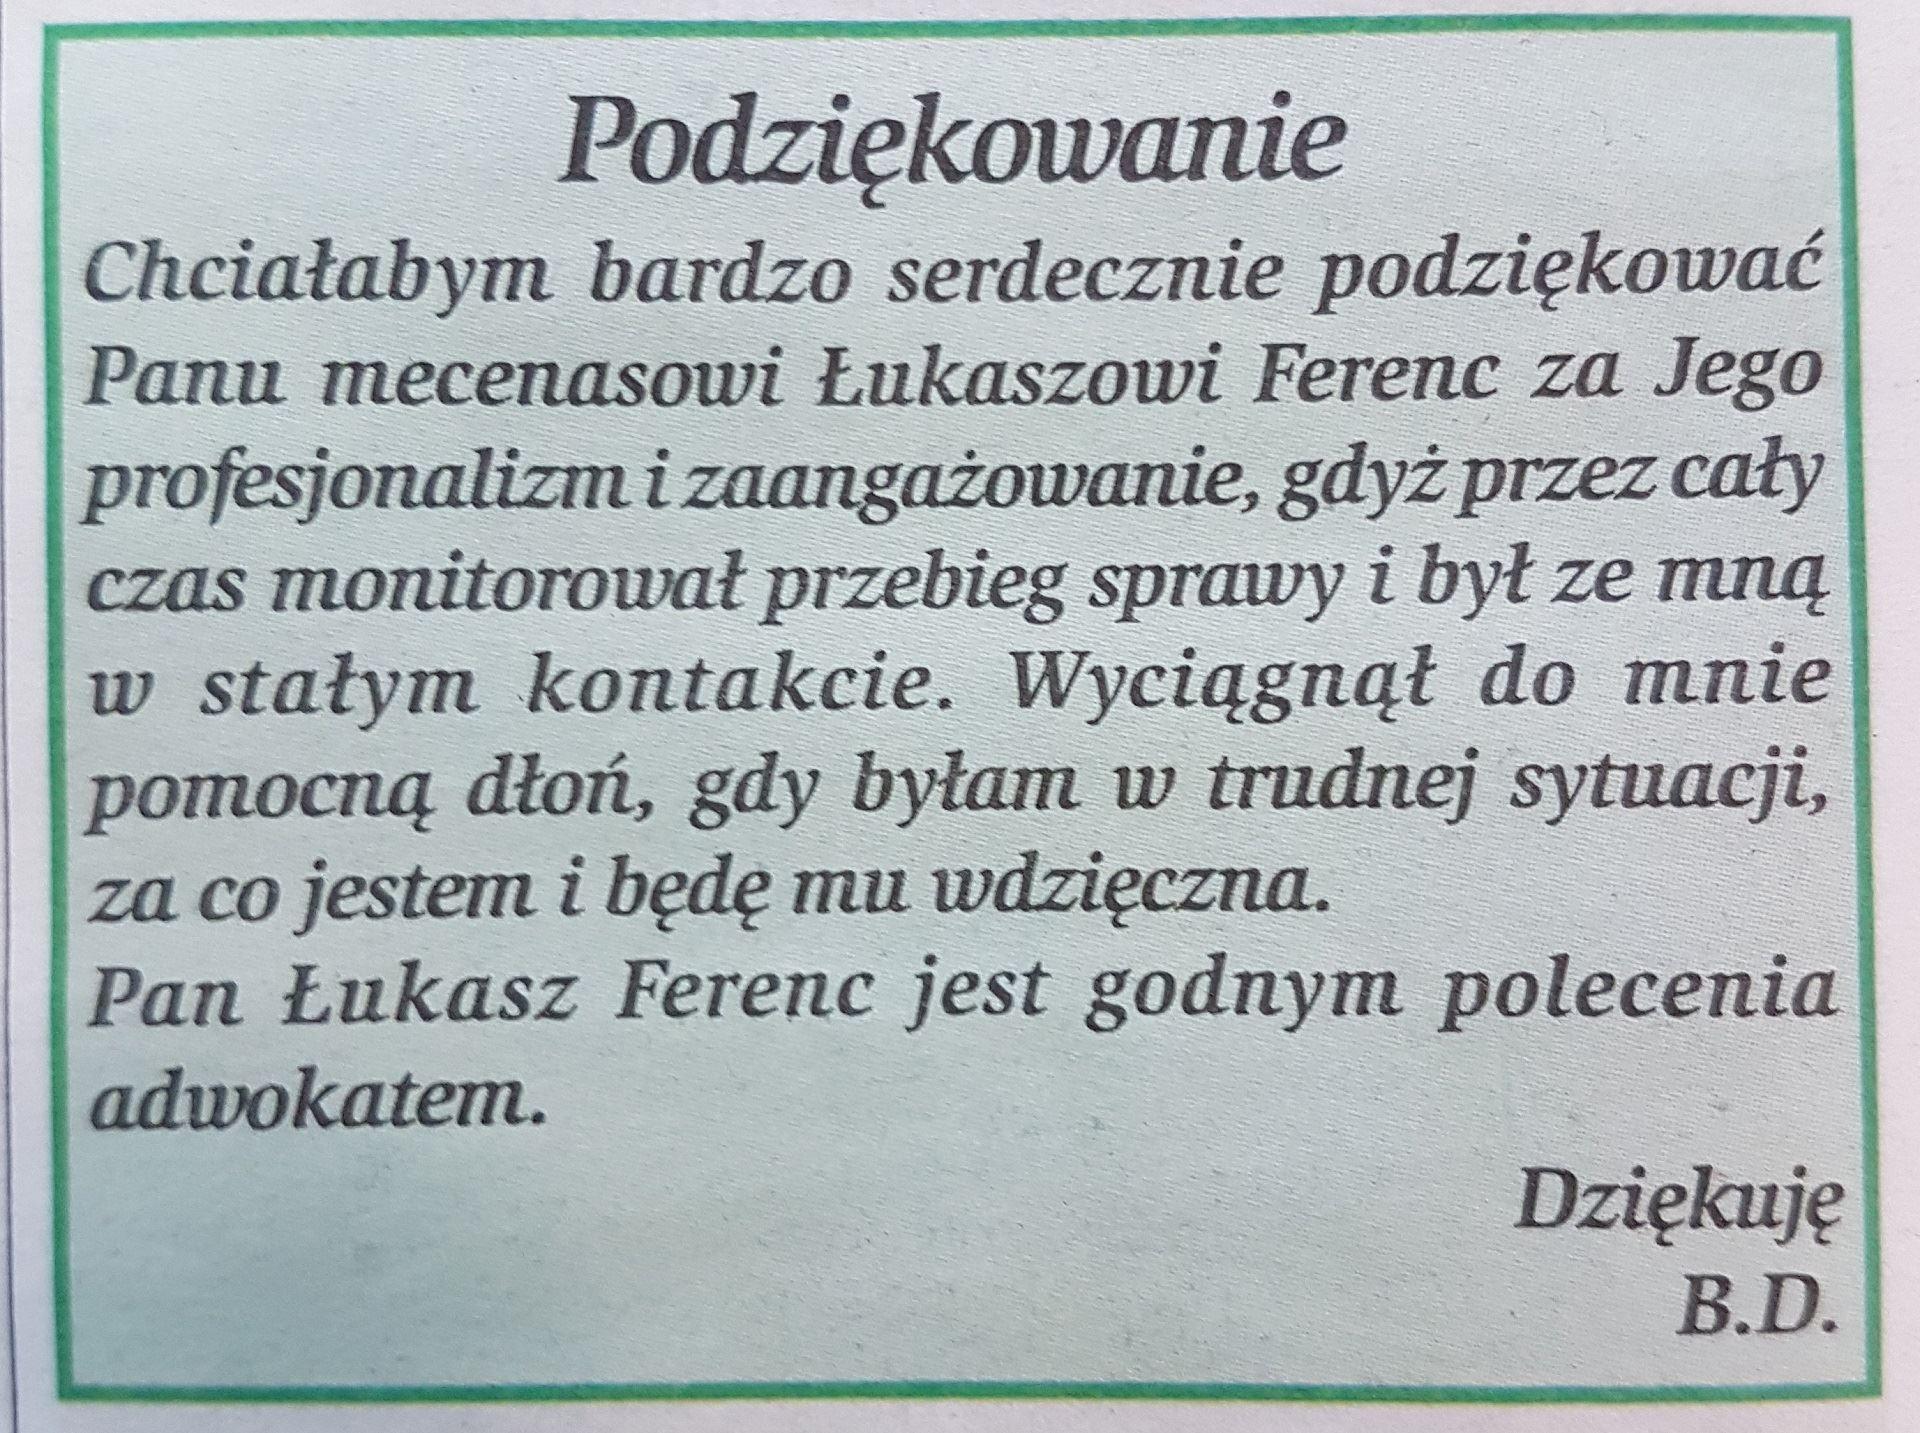 Łukasz Ferenc Adwokat Jawor